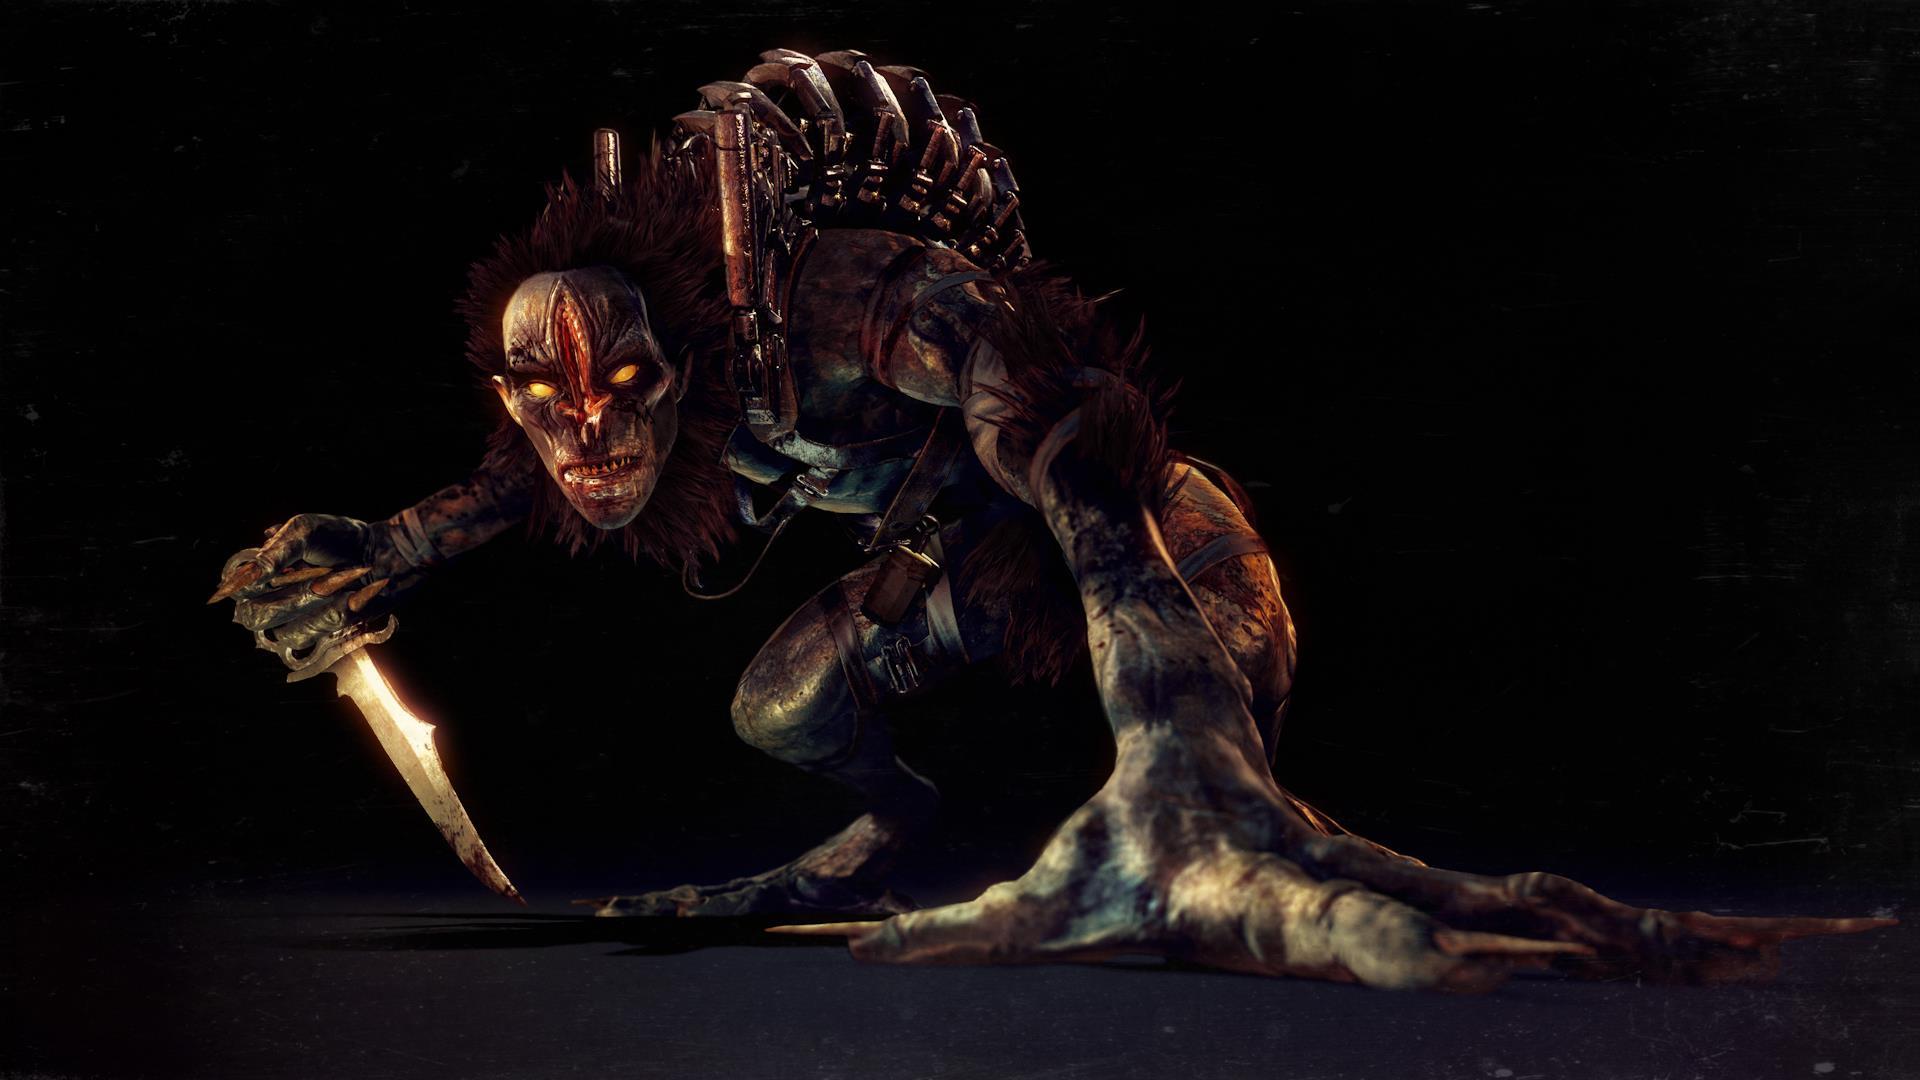 Devil May Cry Artworks 4 تصاویرهنری جدید Devil May Cry نشان از ذوق هنری در بازی میدهد